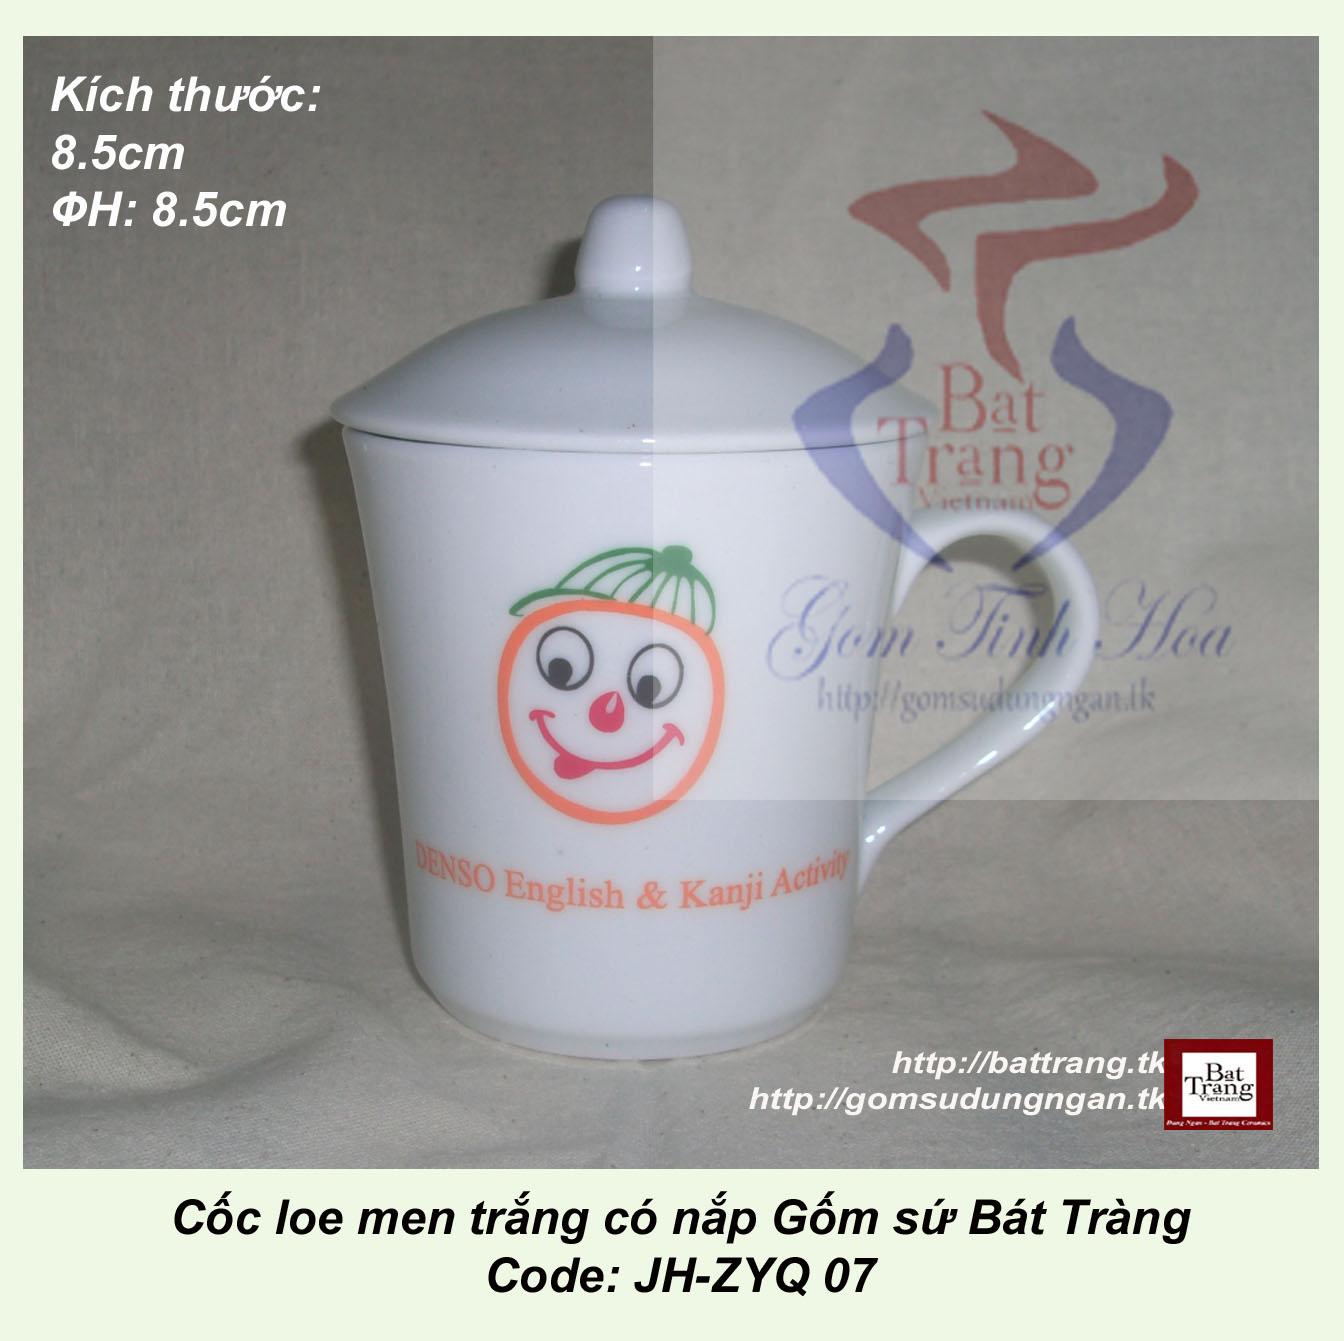 trang+co+nap+in+logo+Qua+tang+Hoi+nghi+Hoi+thao+Cong+ty+Bat+Trang+Gom